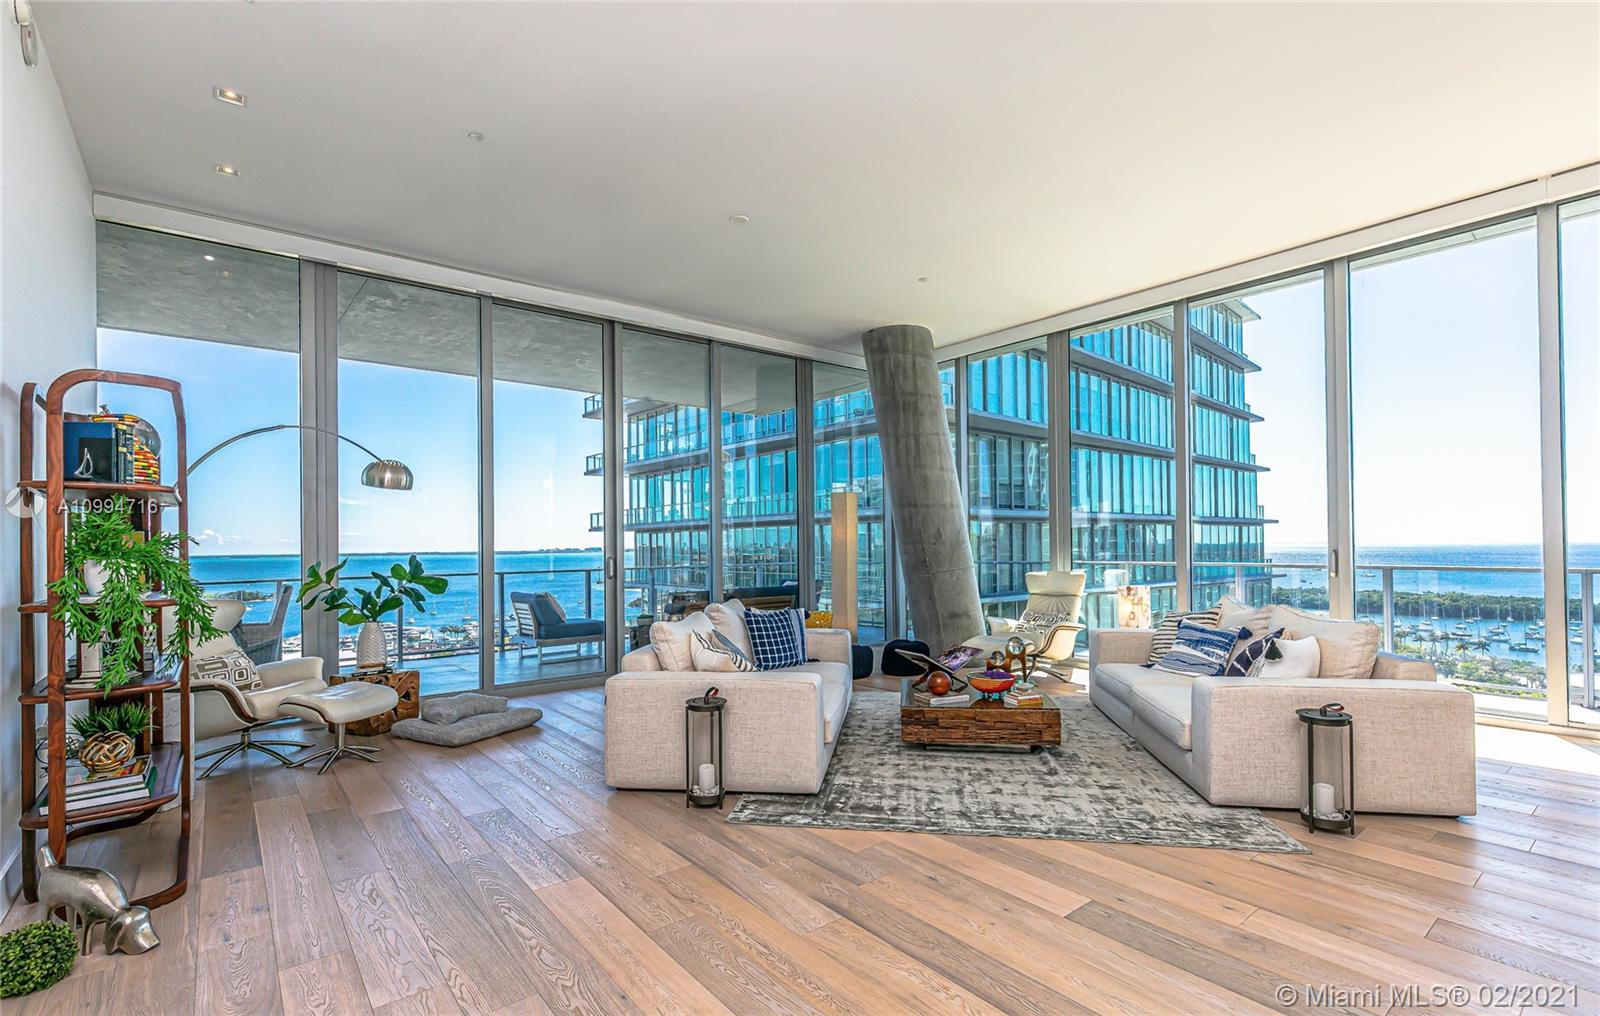 Grove At Grand Bay North Tower #1401N - 2669 S Bayshore Dr #1401N, Miami, FL 33133